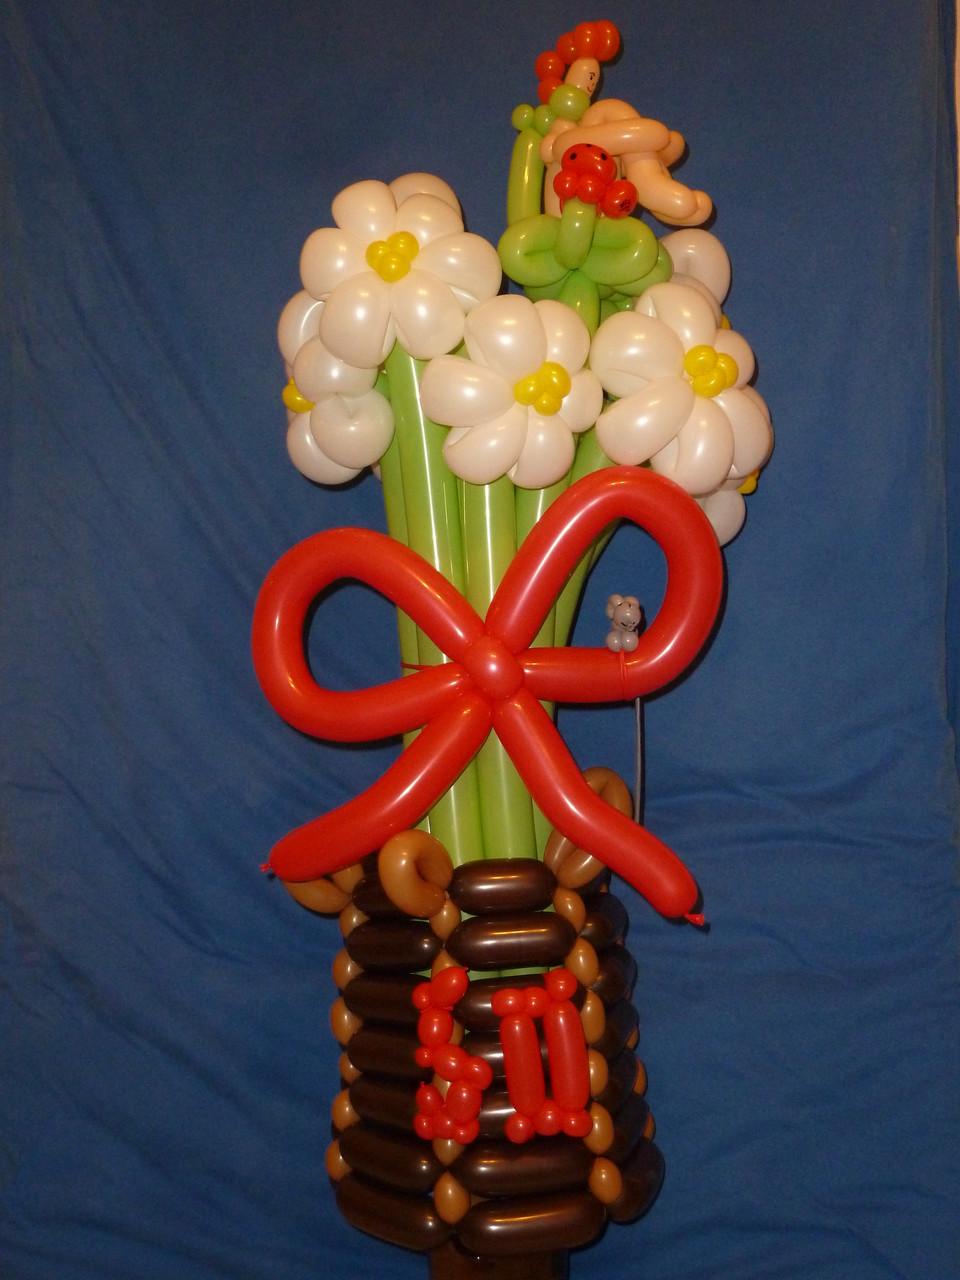 Ballonblumen twisten, Geburtstag, Blumenstrauß ,Mr. toni balloni ch